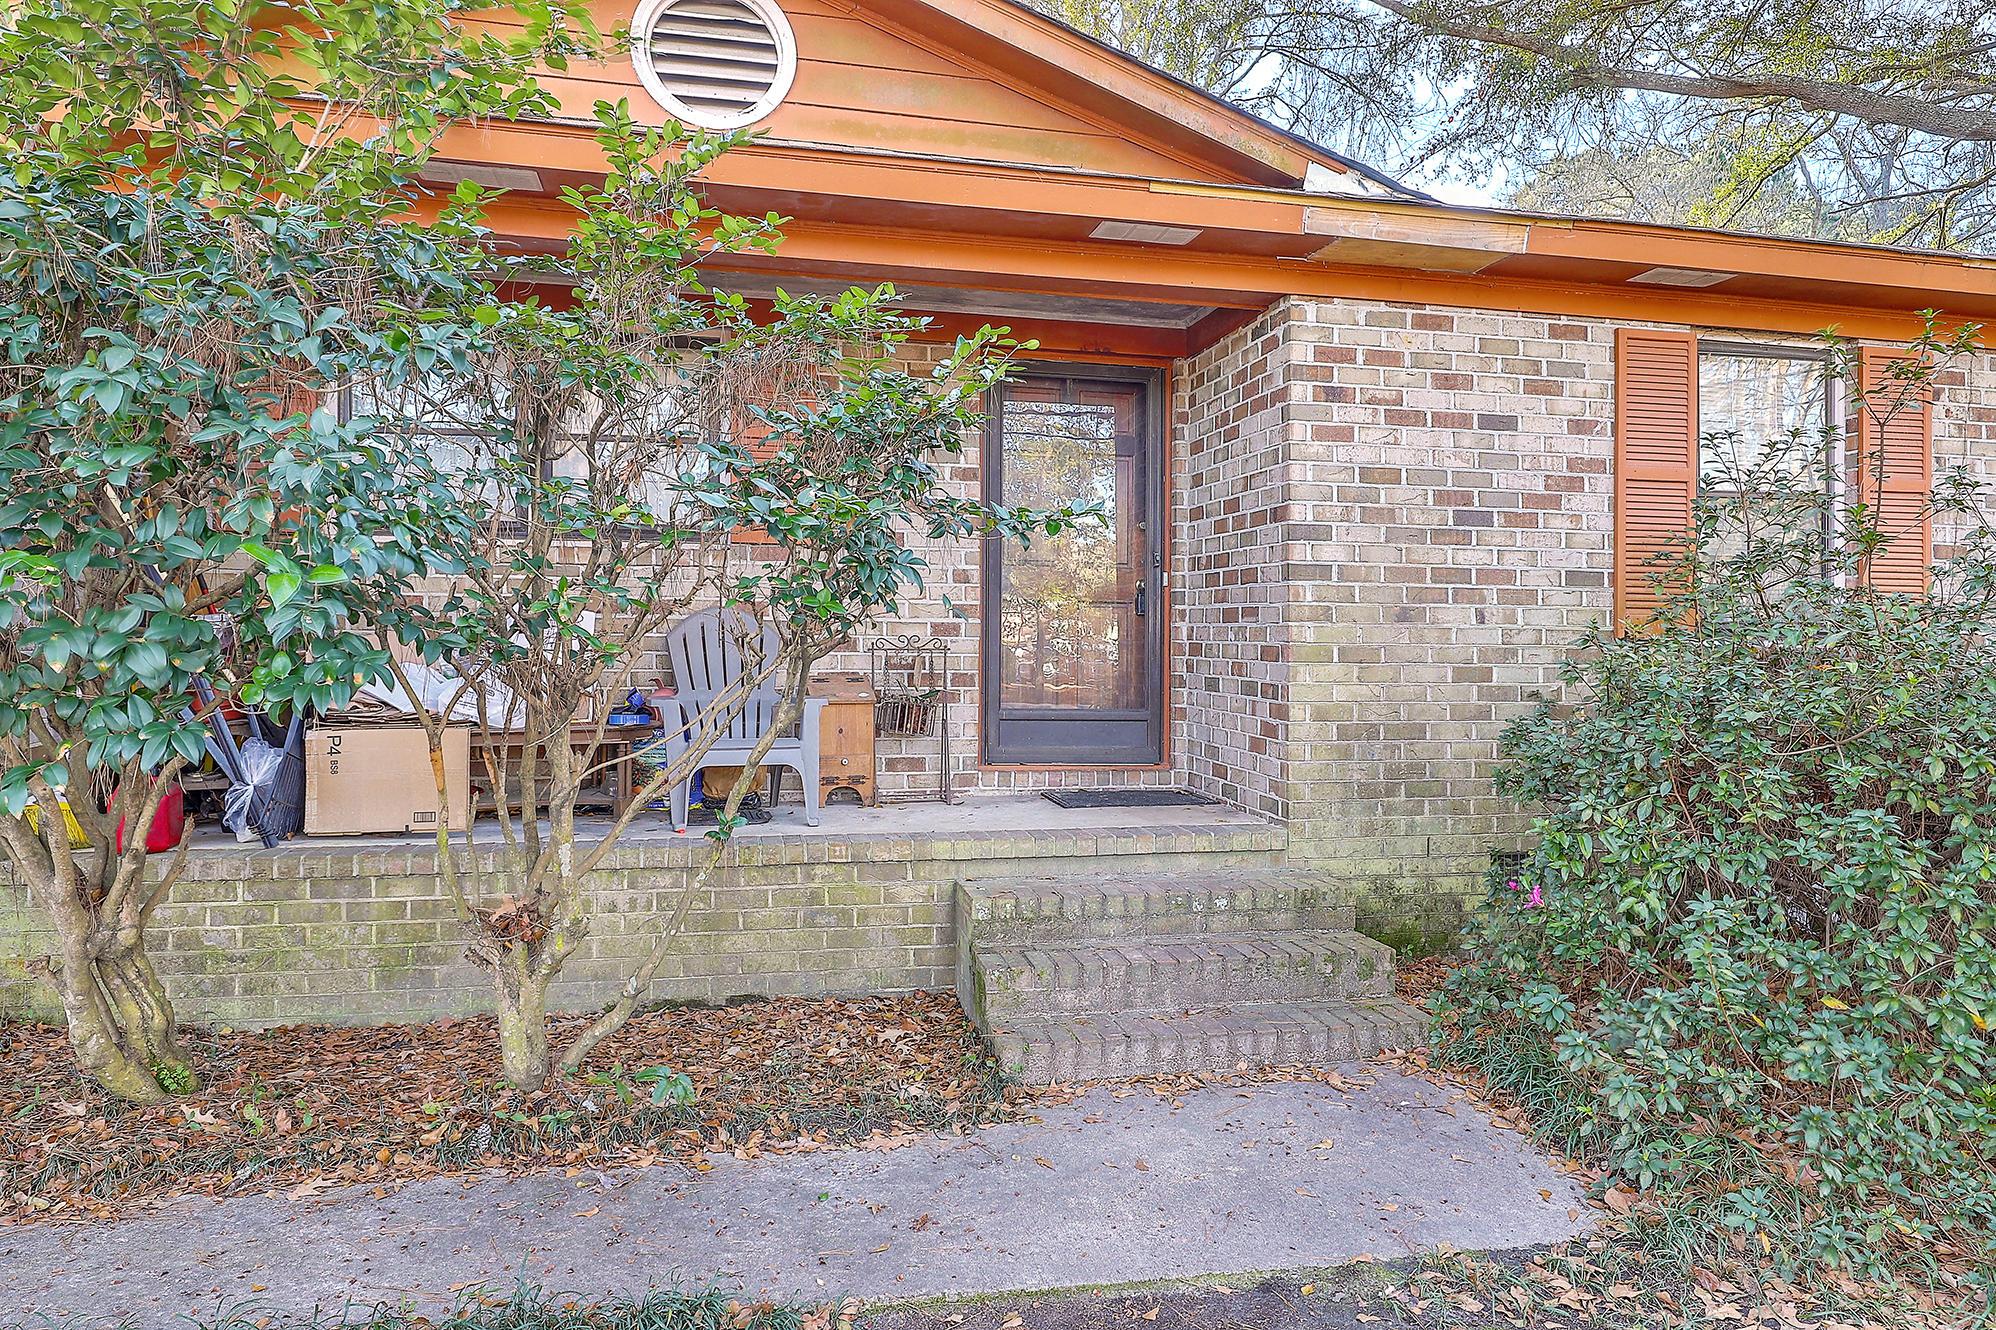 Double Oaks Homes For Sale - 1744 Dogwood, Charleston, SC - 0